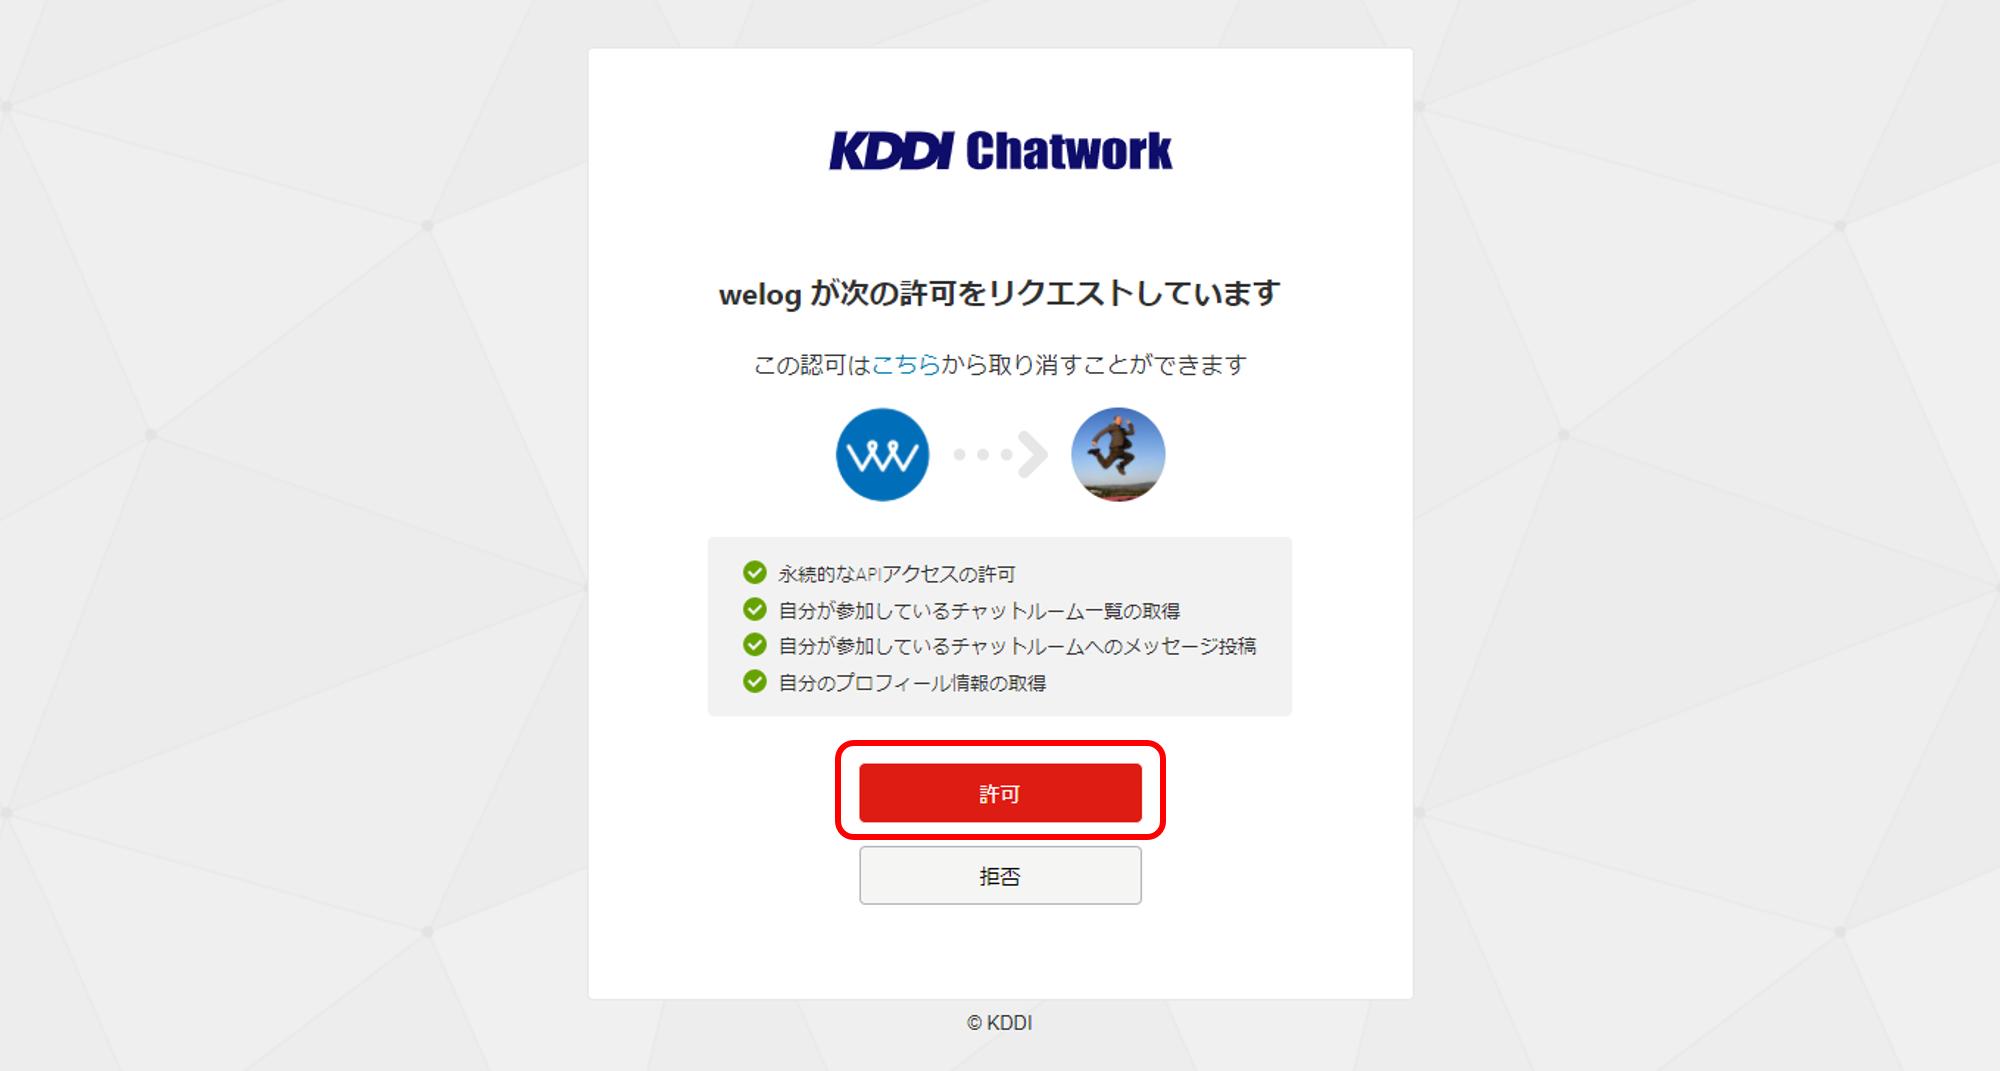 welog-Chatwork連携手順_3_FAQ掲載用.png